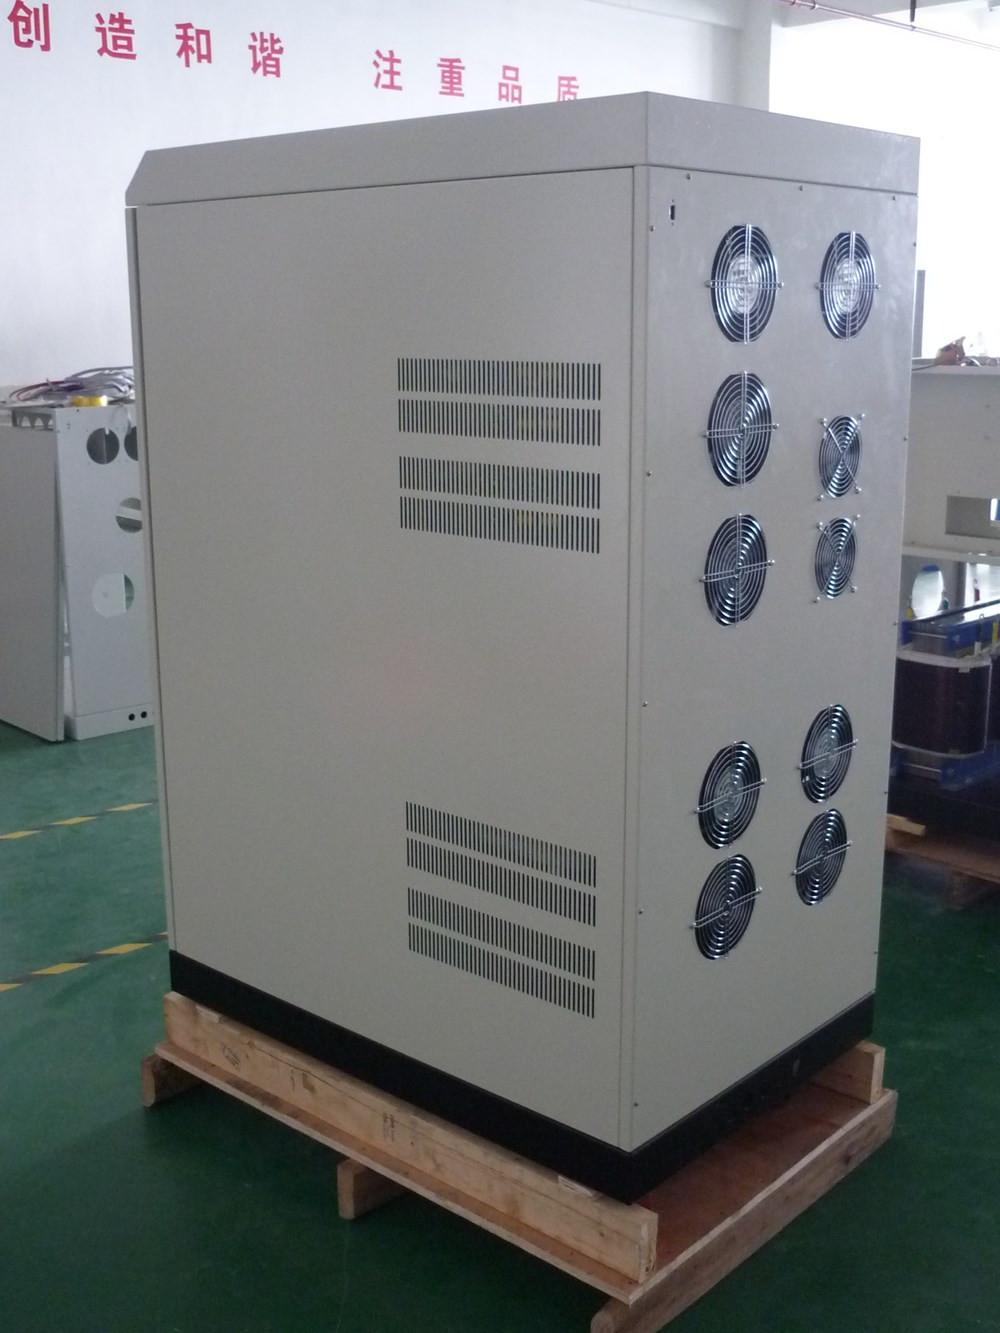 Bosin 计算机系统 ups不间断电源100KW蓄电池